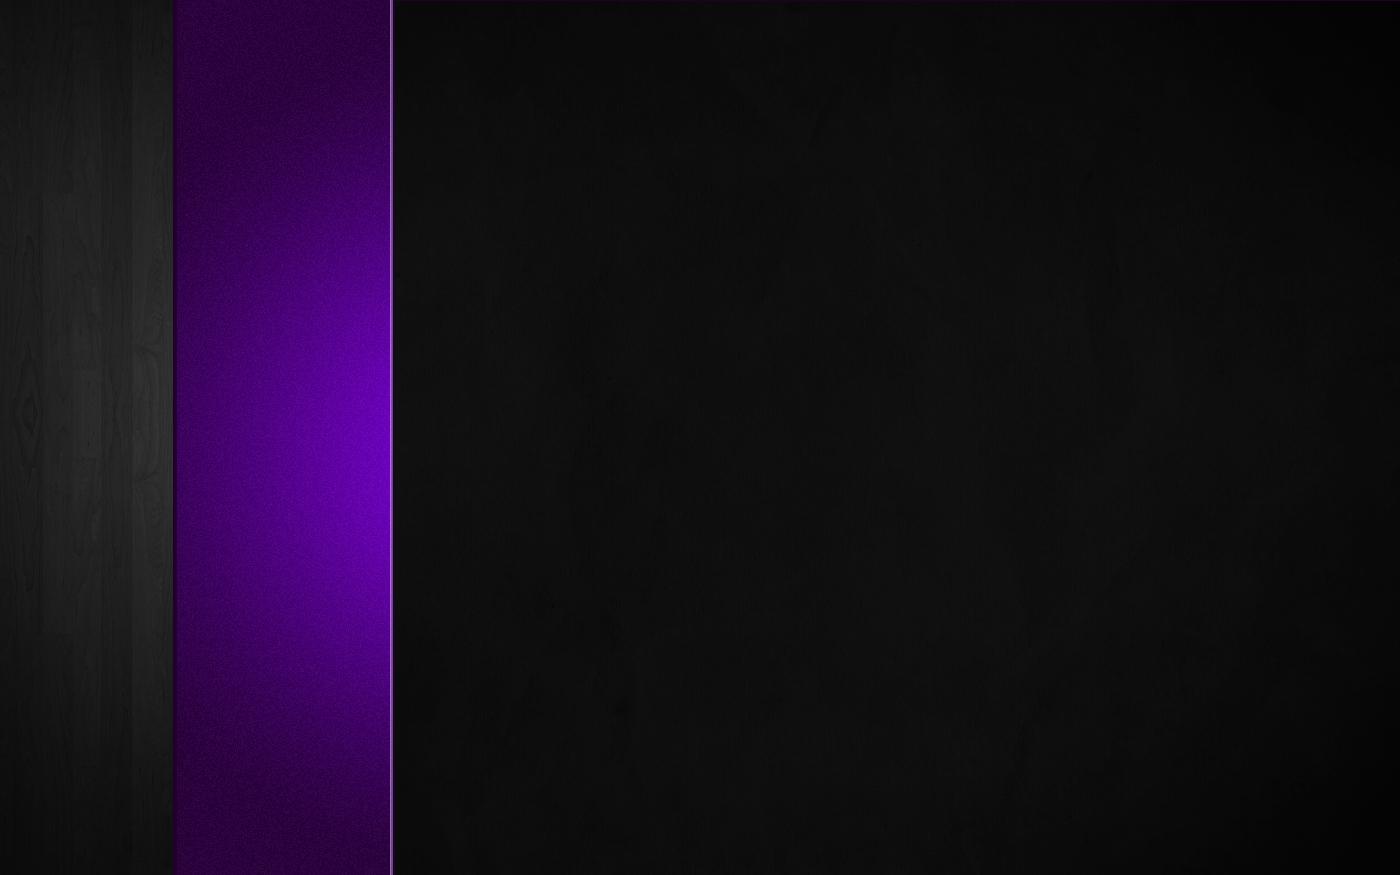 Black And Purple Wallpaper Cool Wallpaper